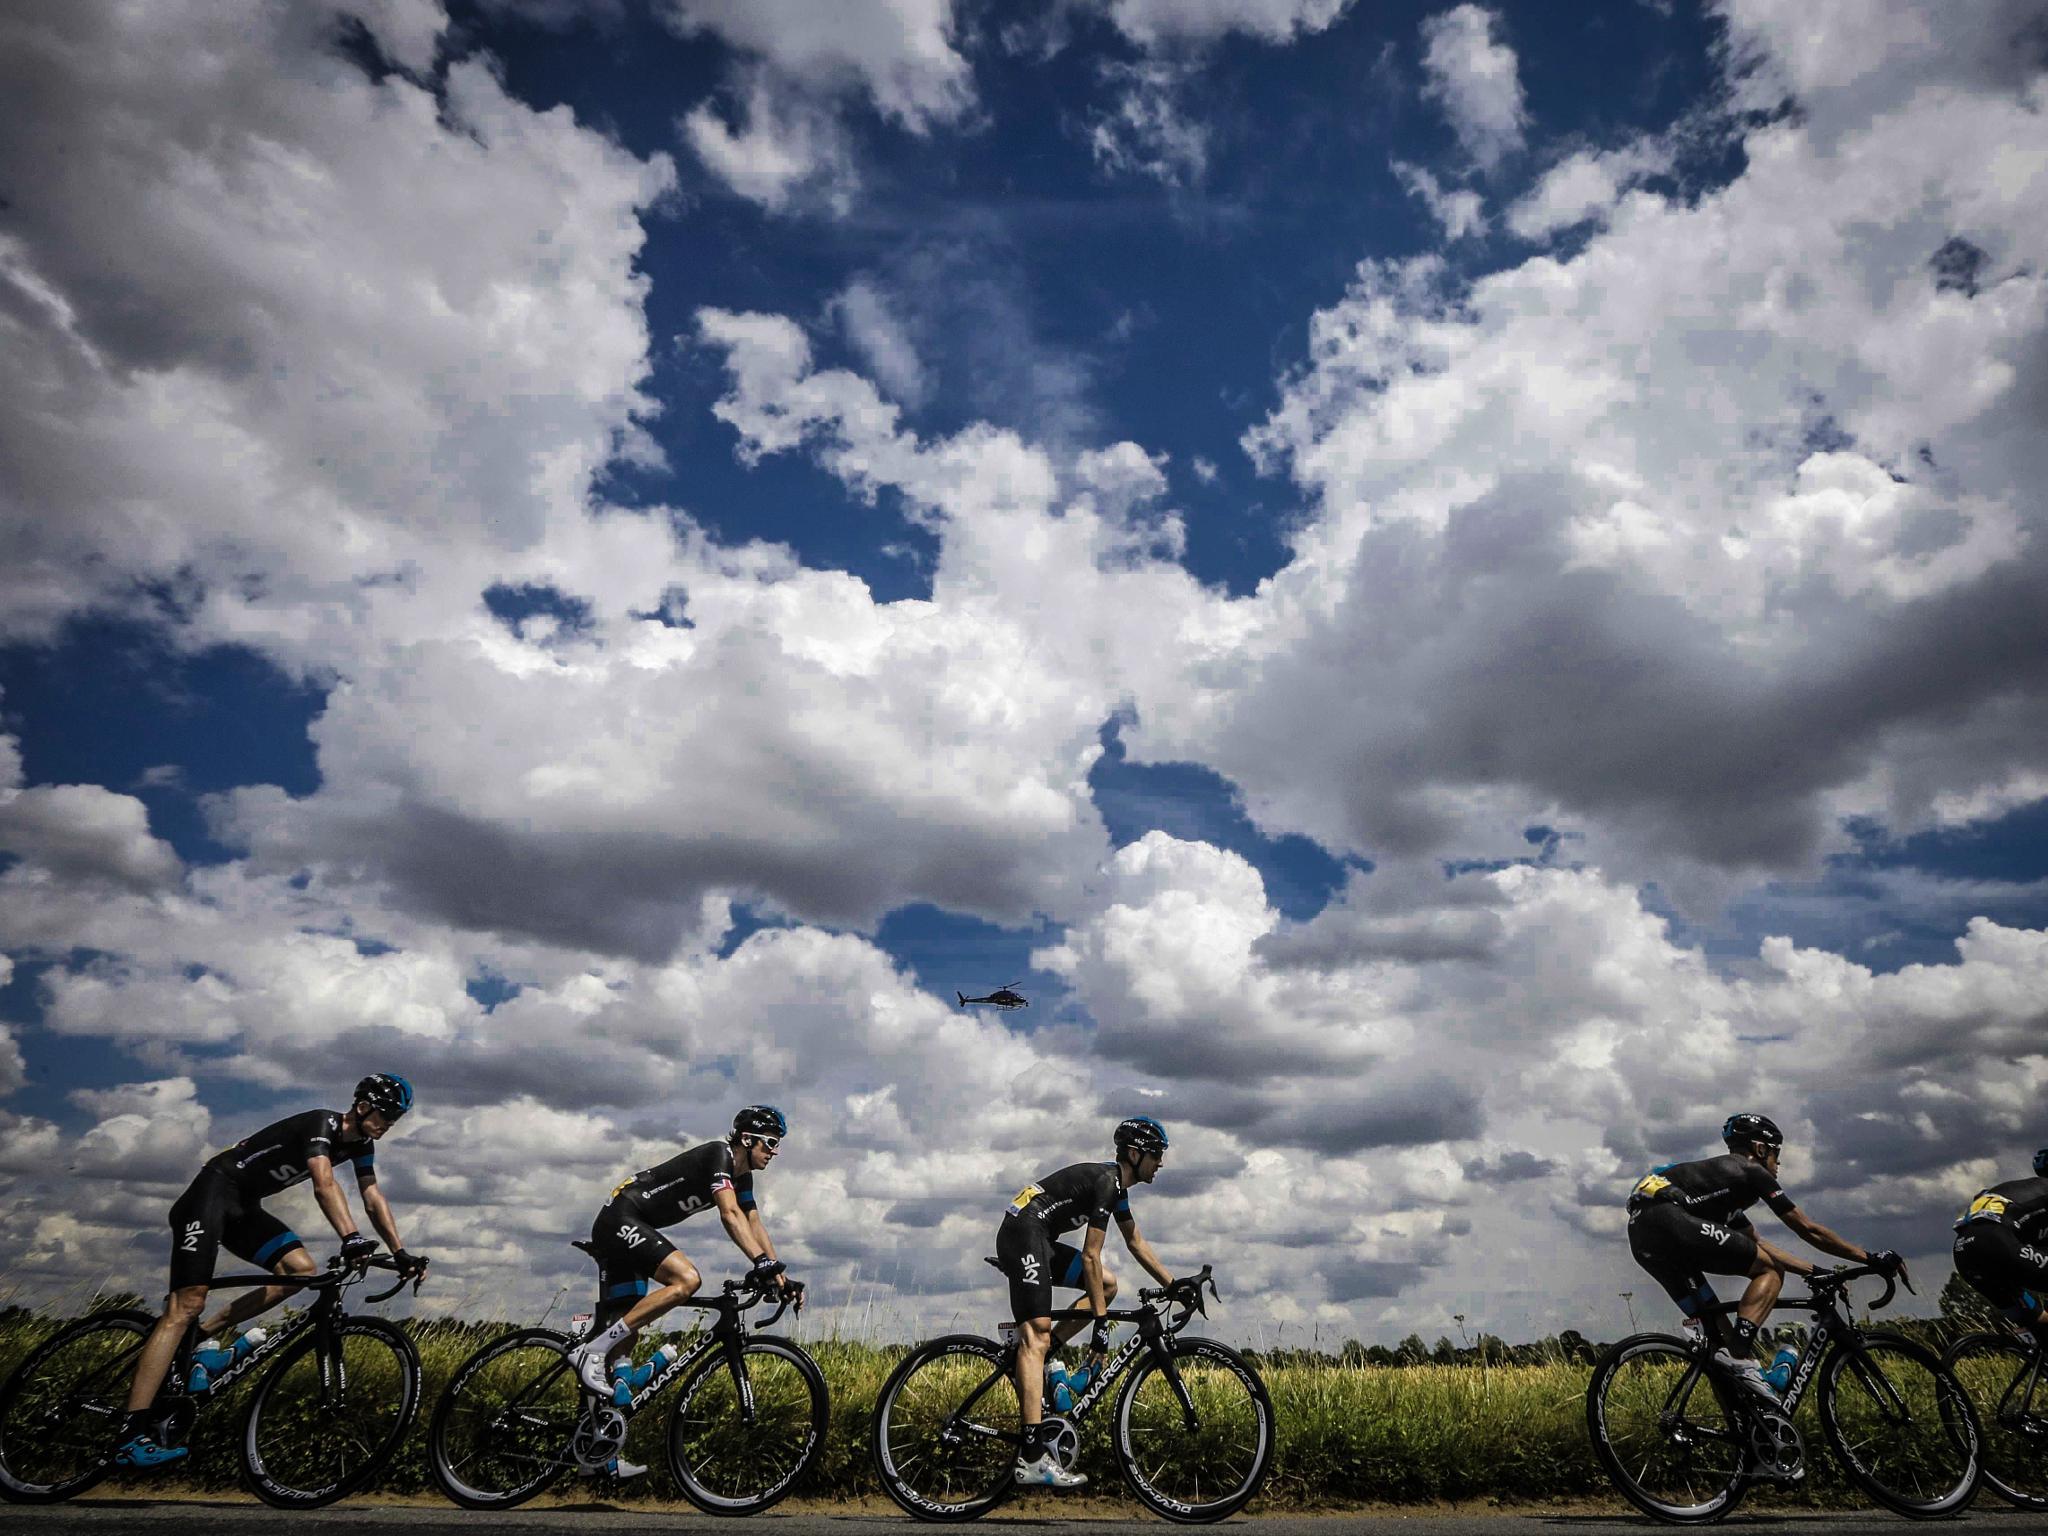 Equipo Sky tour de france 2014 by Miguel Angel Posincovich